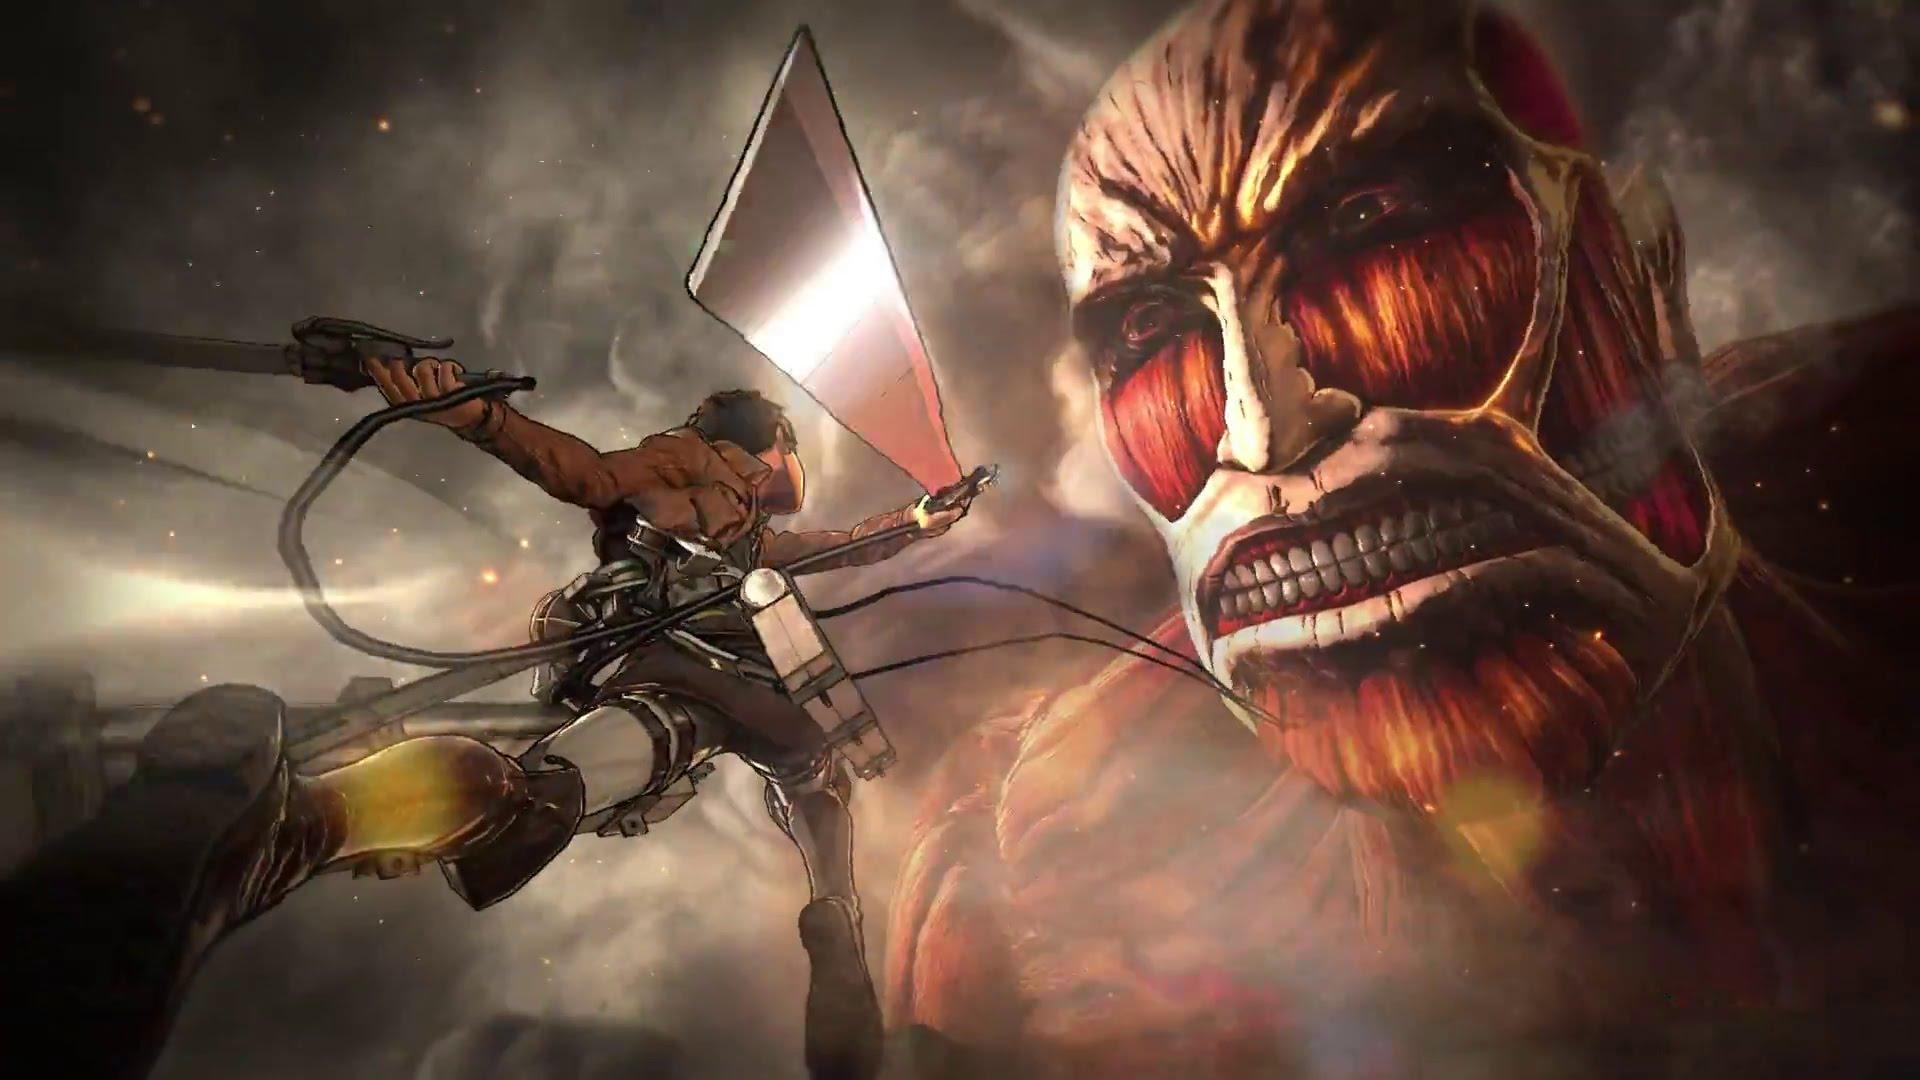 Modojo | Koei Tecmo Releases Videos Detailing the Attack on Titan Battle System